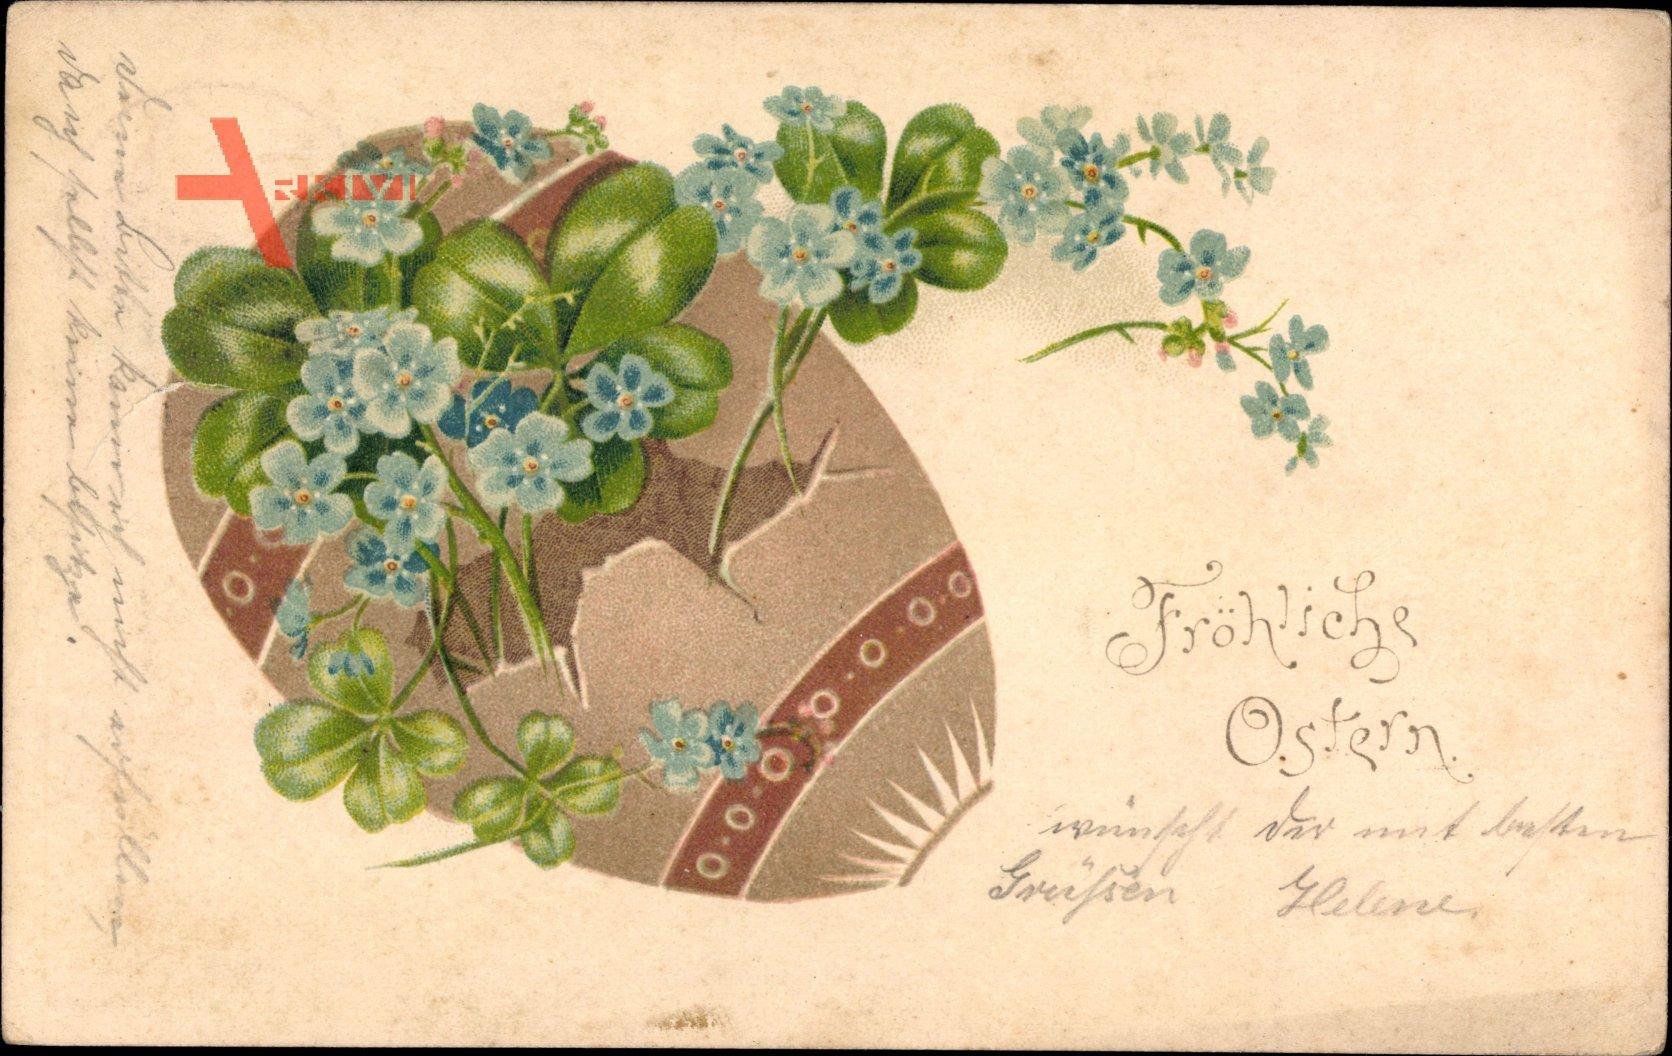 Glückwunsch Ostern, Buntes Osterei, Kleeblätter